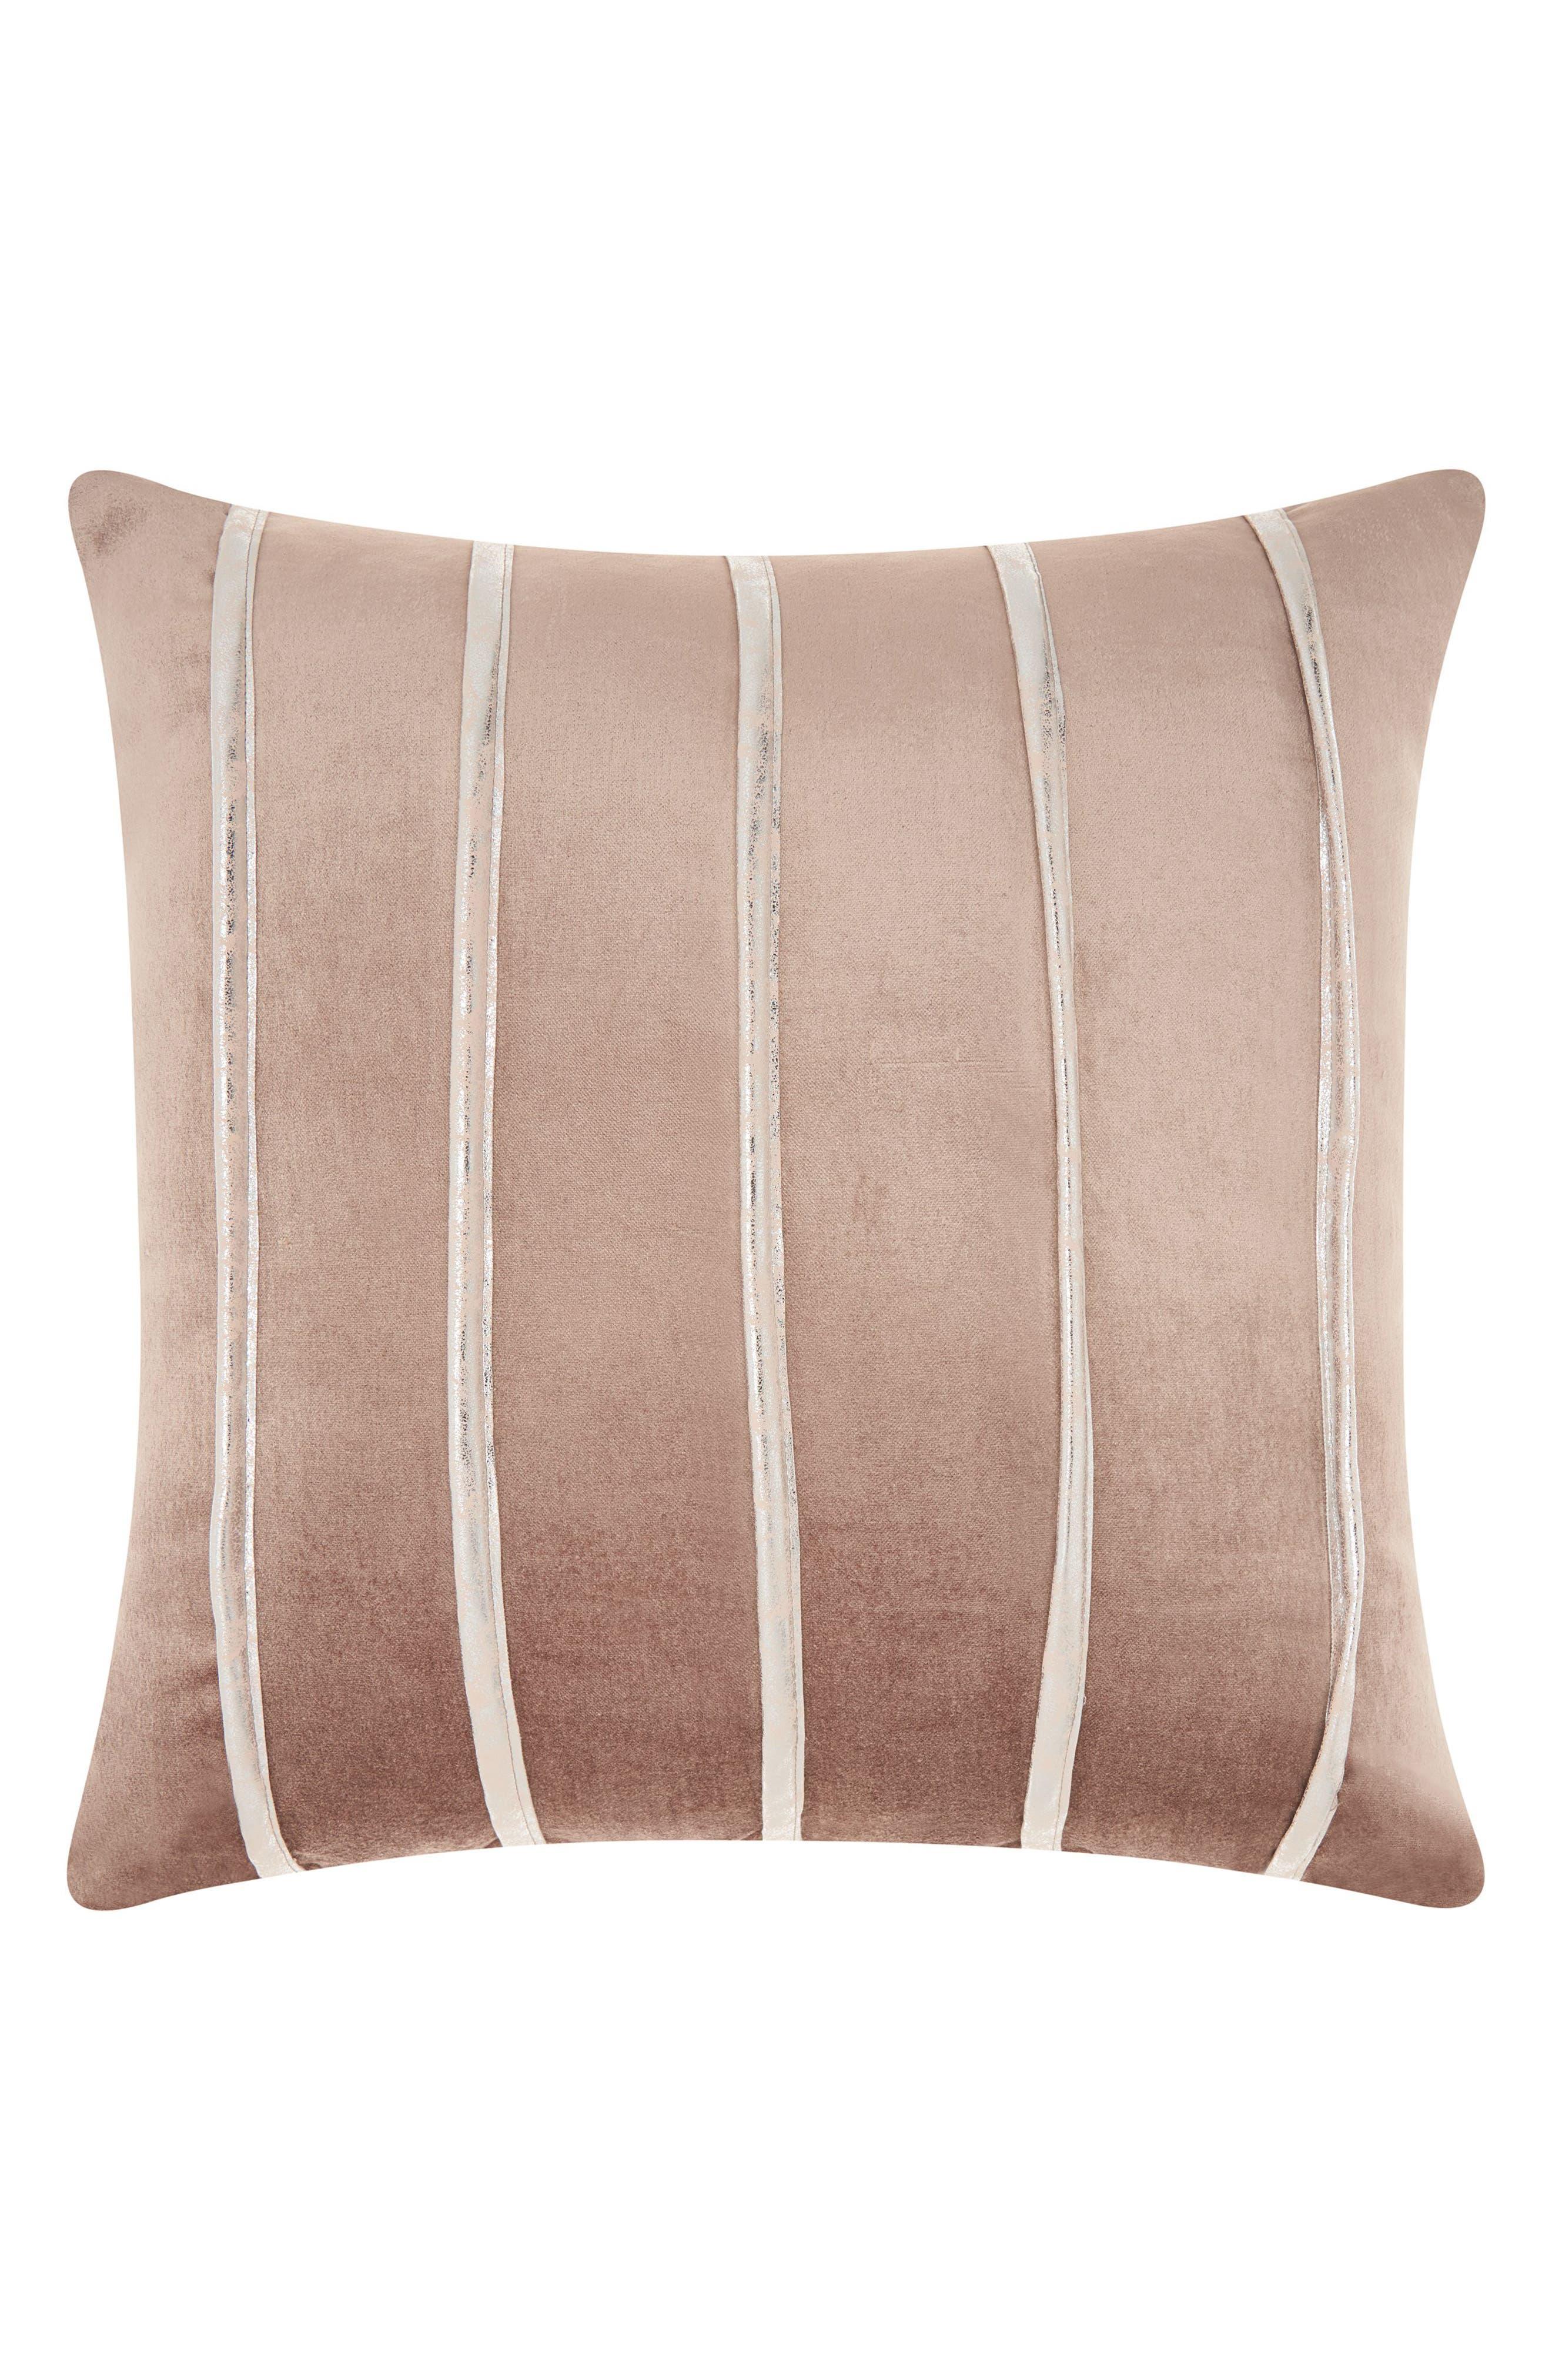 Stripe Velvet Accent Pillow,                         Main,                         color, 250